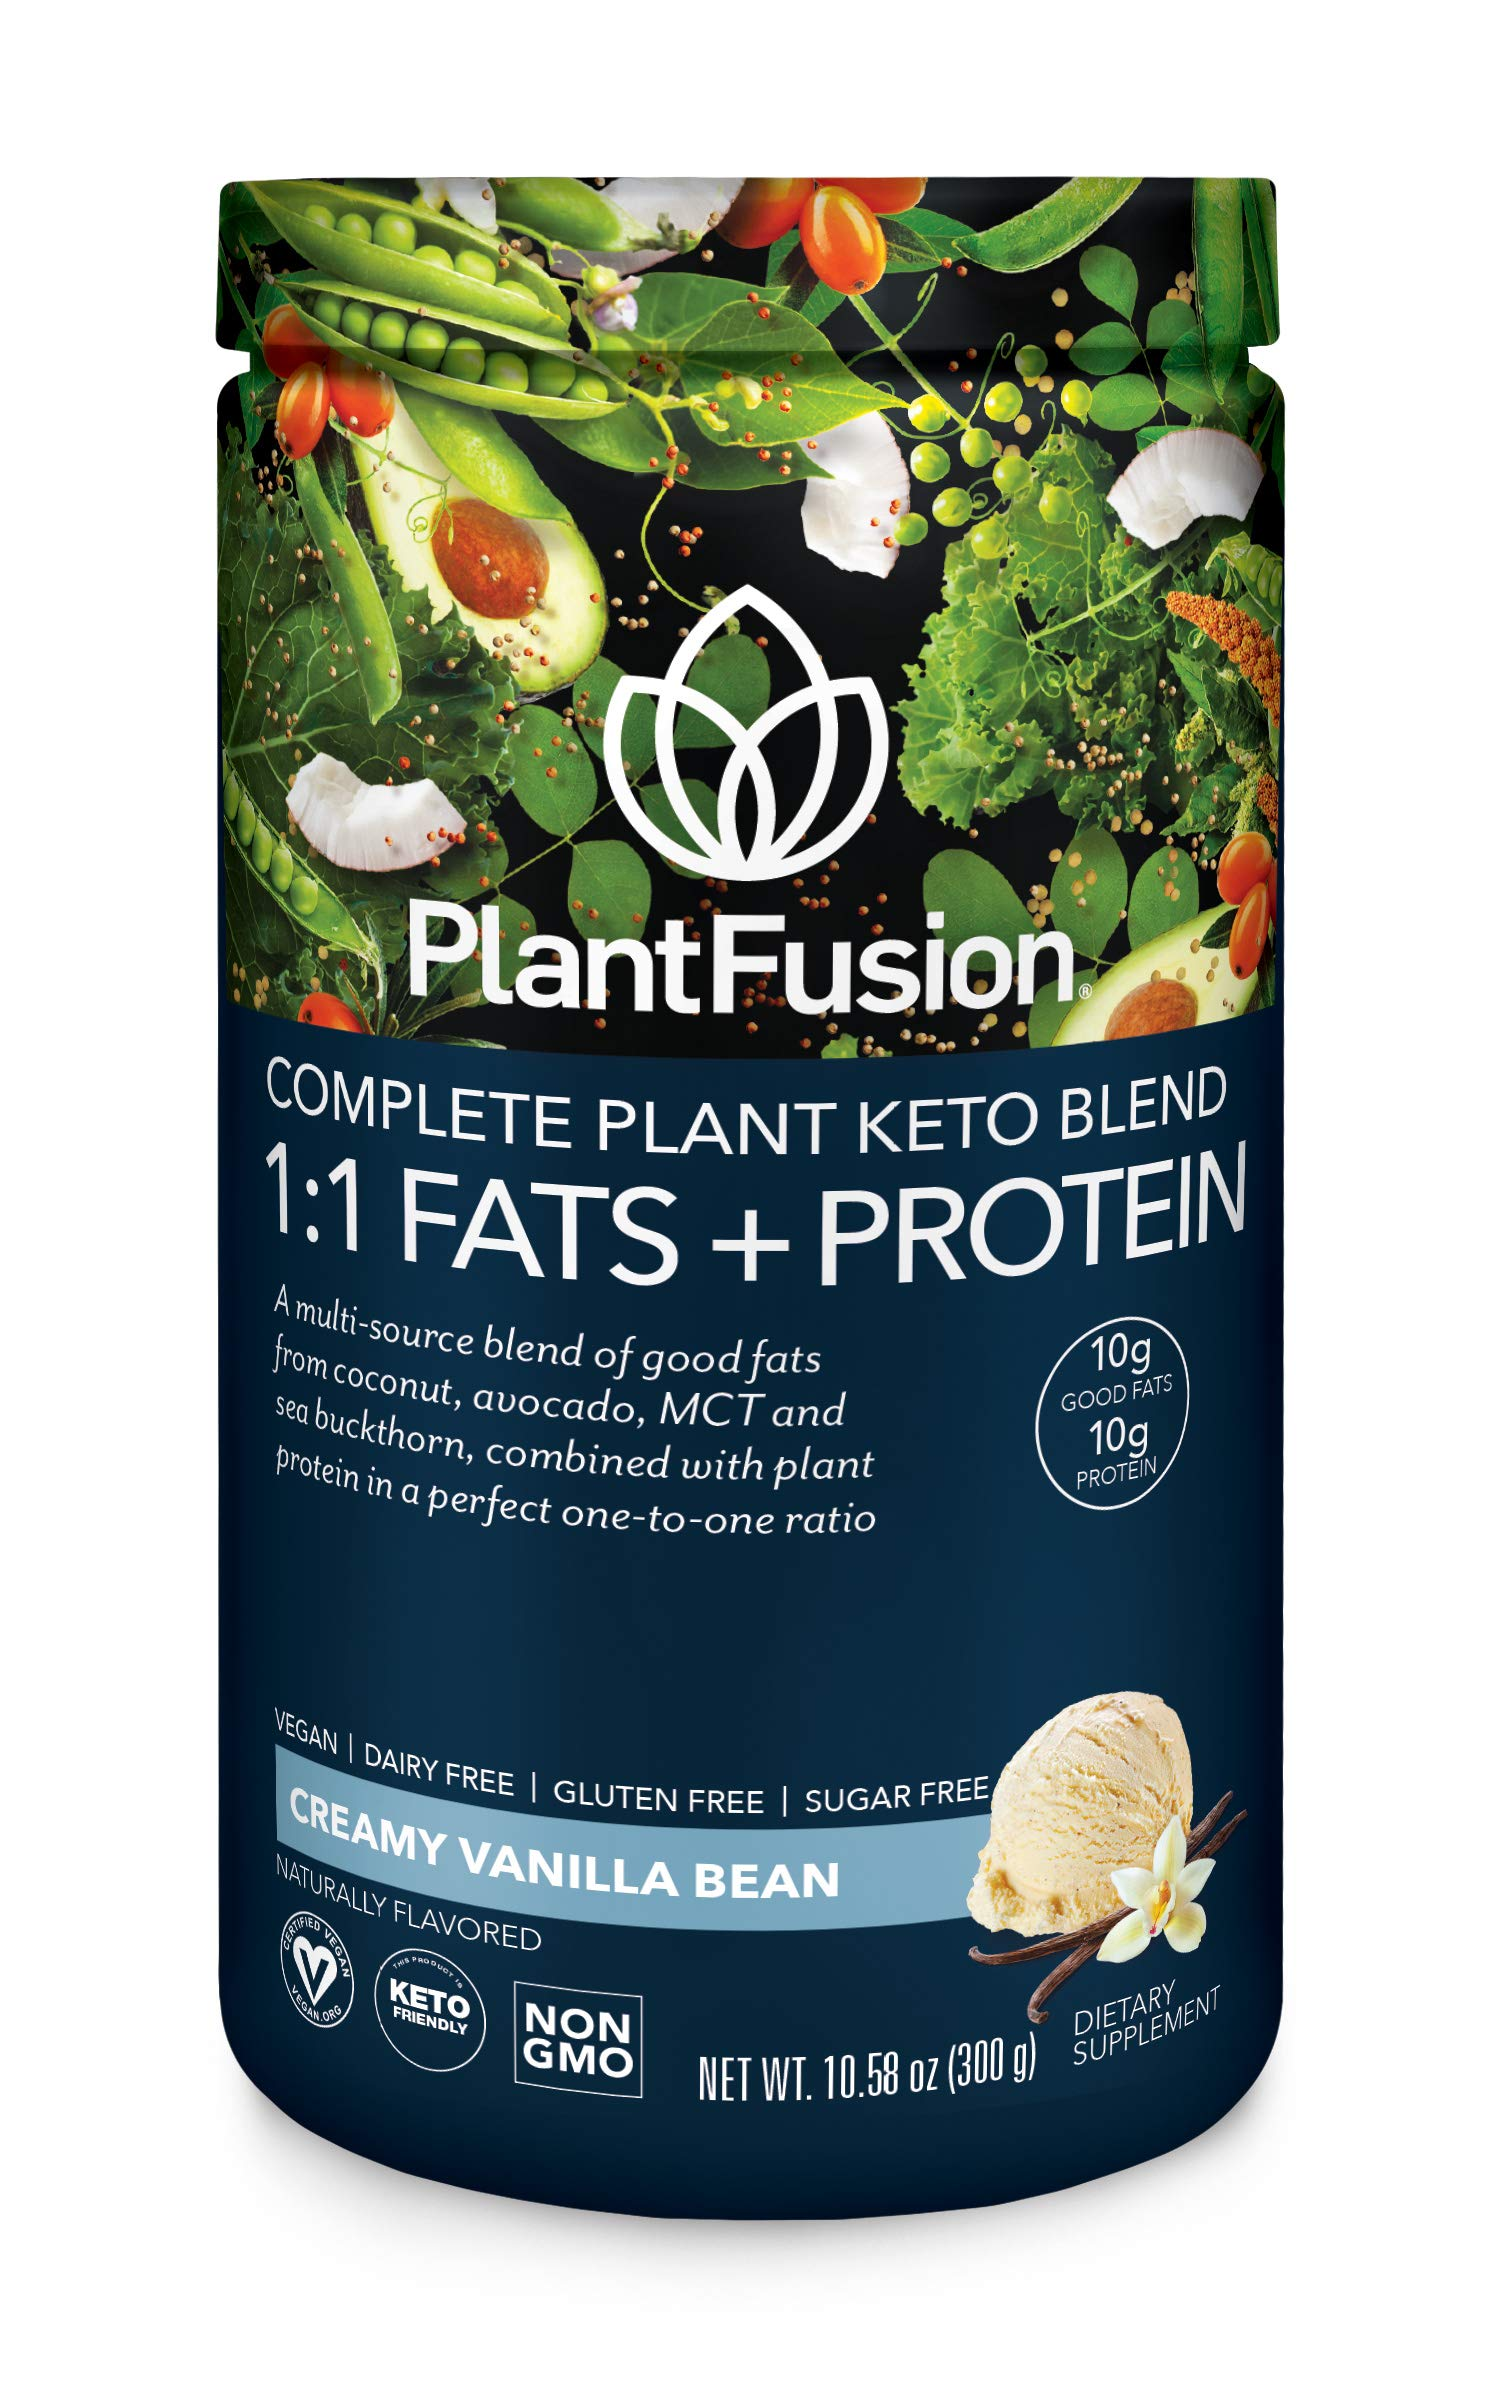 PlantFusion Complete Plant Based Keto Blend |1:1 Fats + Protein Powder Drink, Ketogenic Diet Supplement, MCTs, No Sugar, Gluten Free, Non Dairy, Vegan, Non Soy, Non GMO | Vanilla Bean, 10.58 Oz by PlantFusion